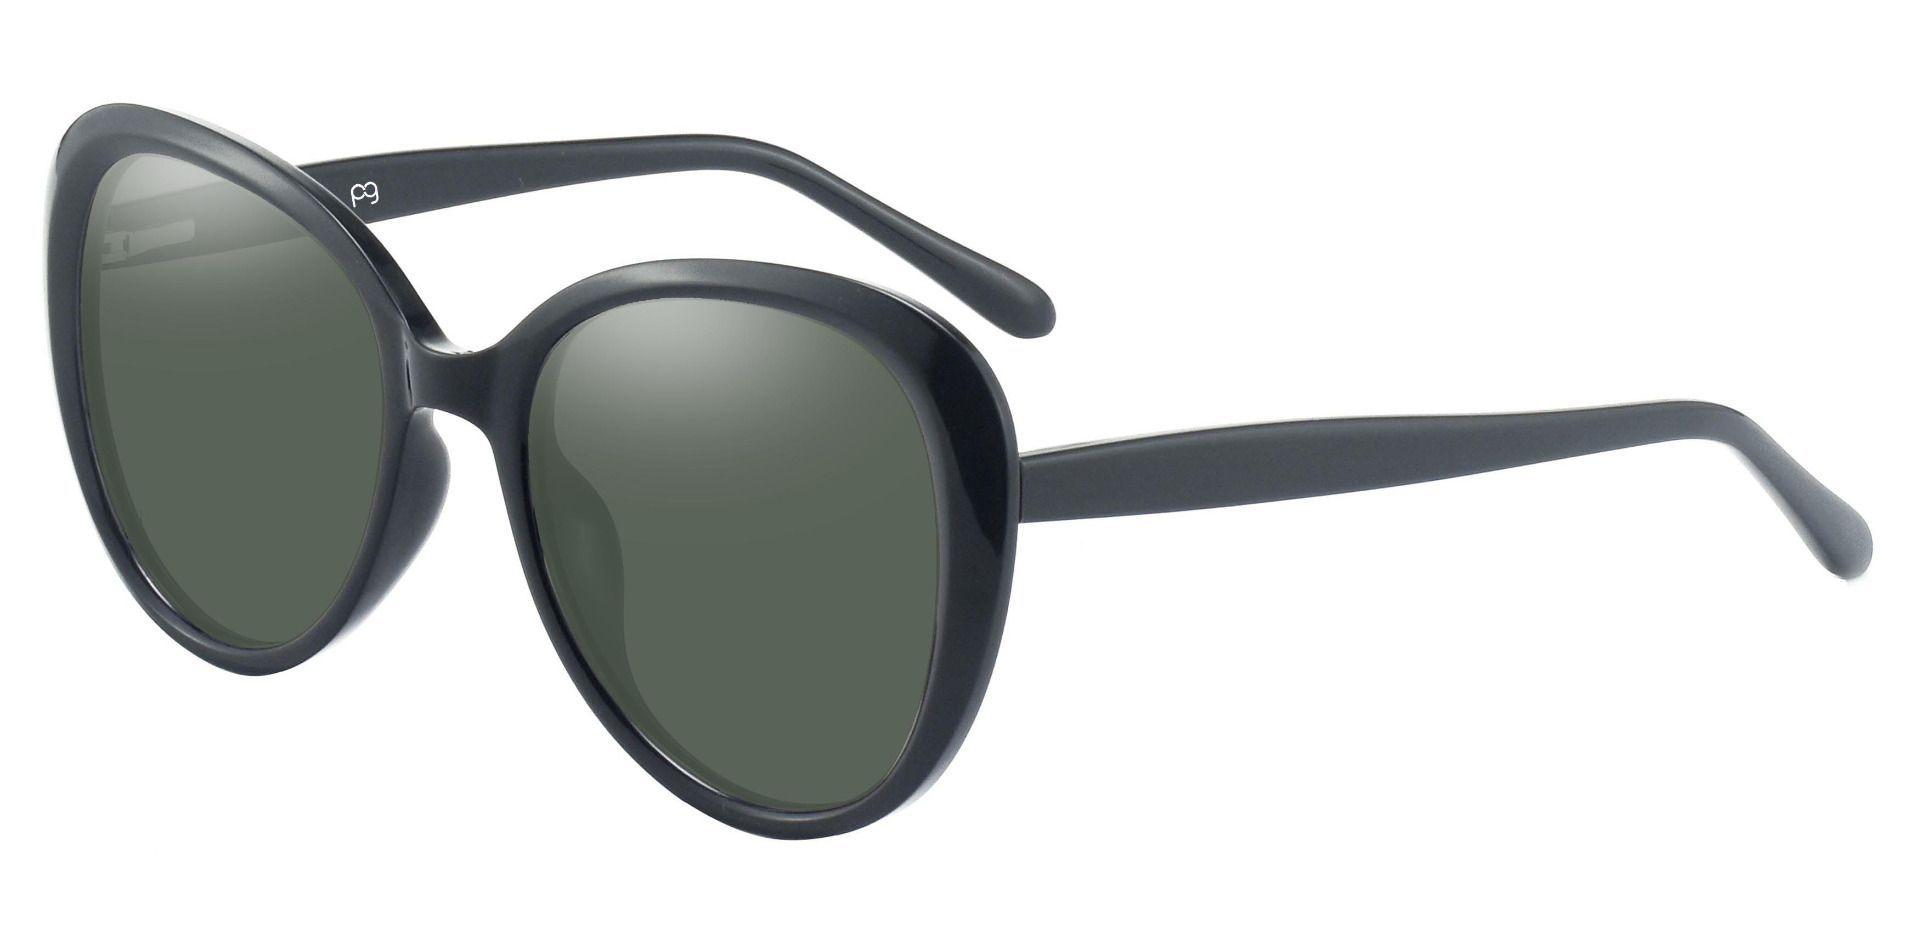 Sheridan Oval Reading Sunglasses - Black Frame With Green Lenses